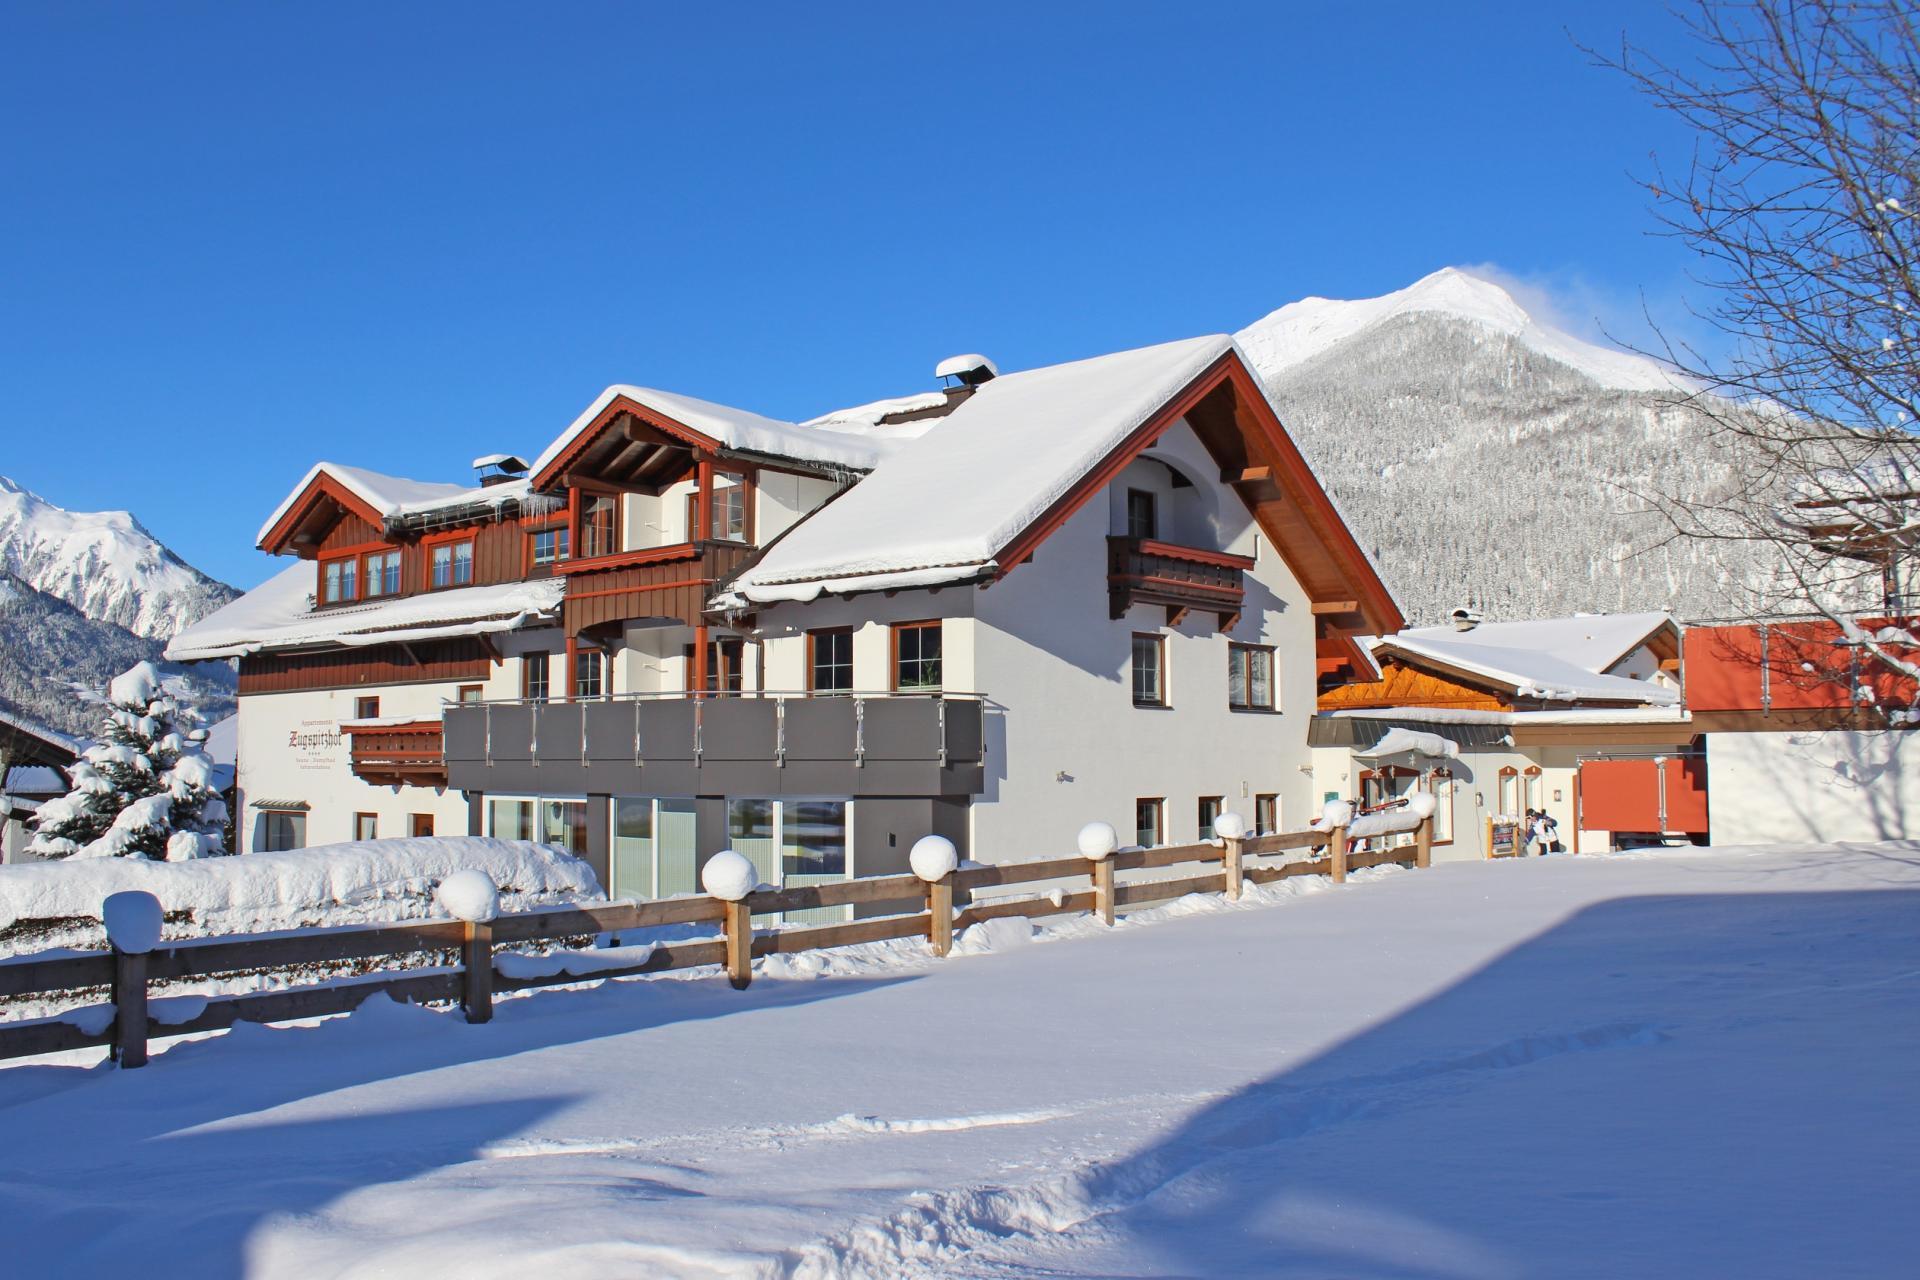 4 Sterne Zugspitzhof Ehrwald #Willkommen#Winter#Corona